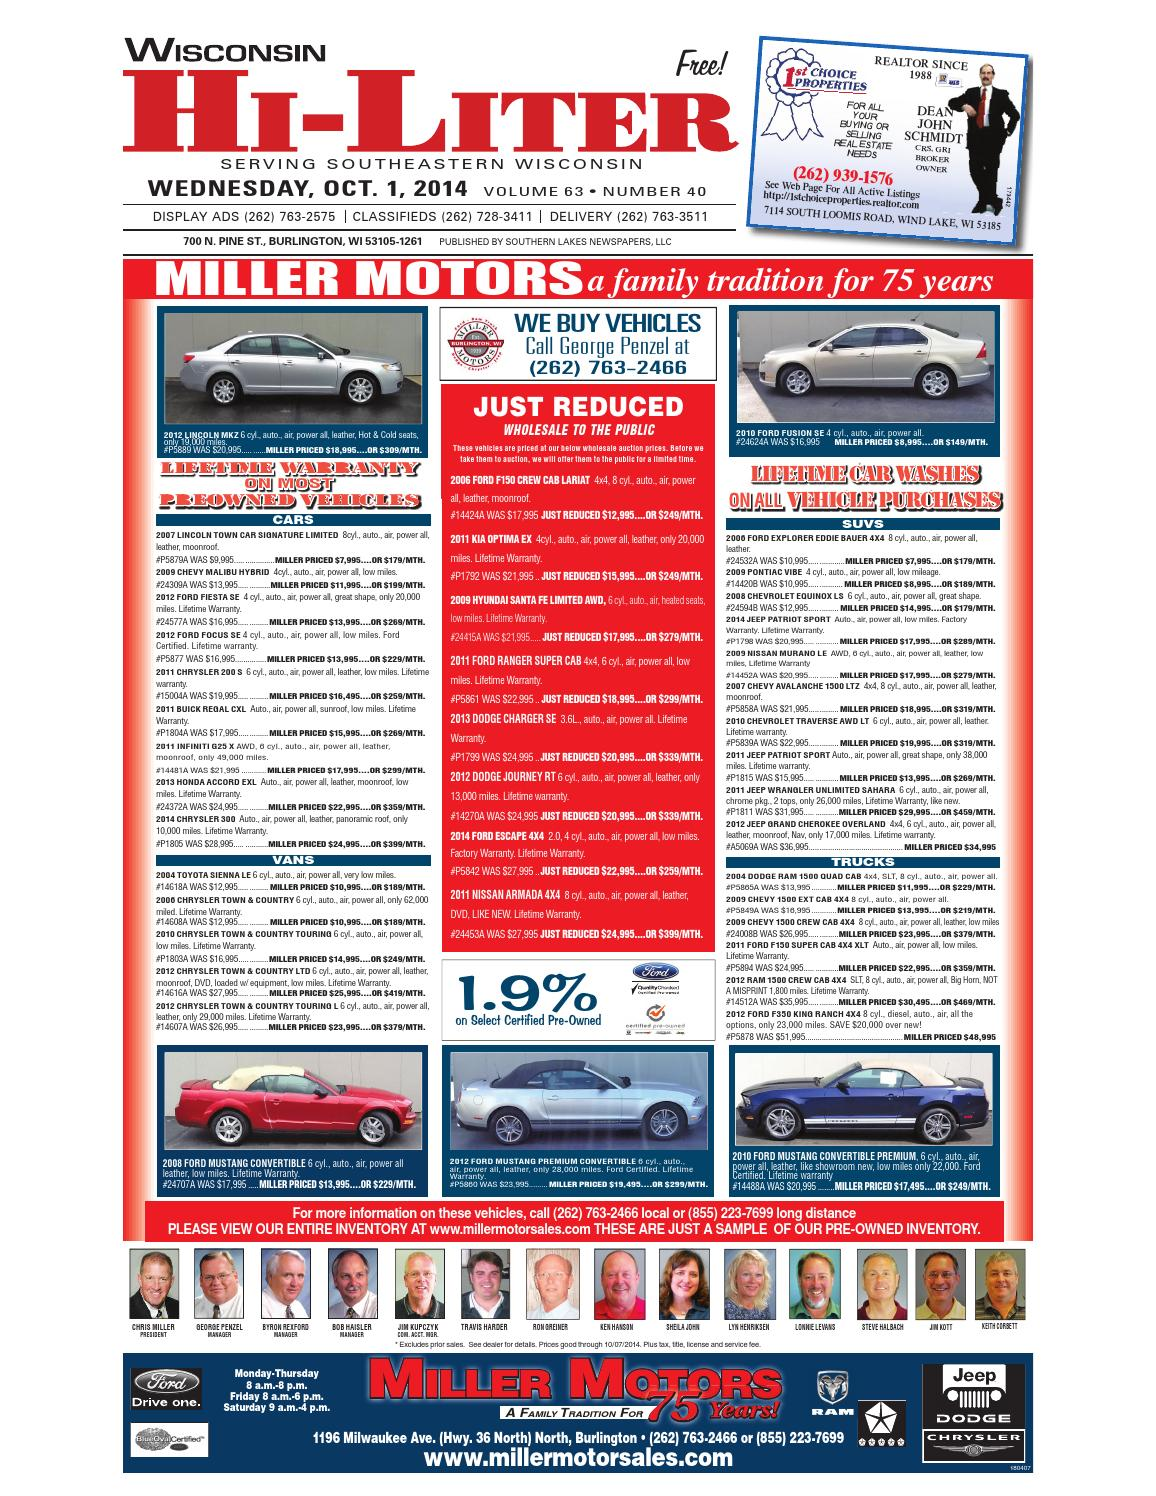 Miller Motors Burlington Wisconsin >> Wis hiliter 10'1'14 by Edward Nadolski - Issuu